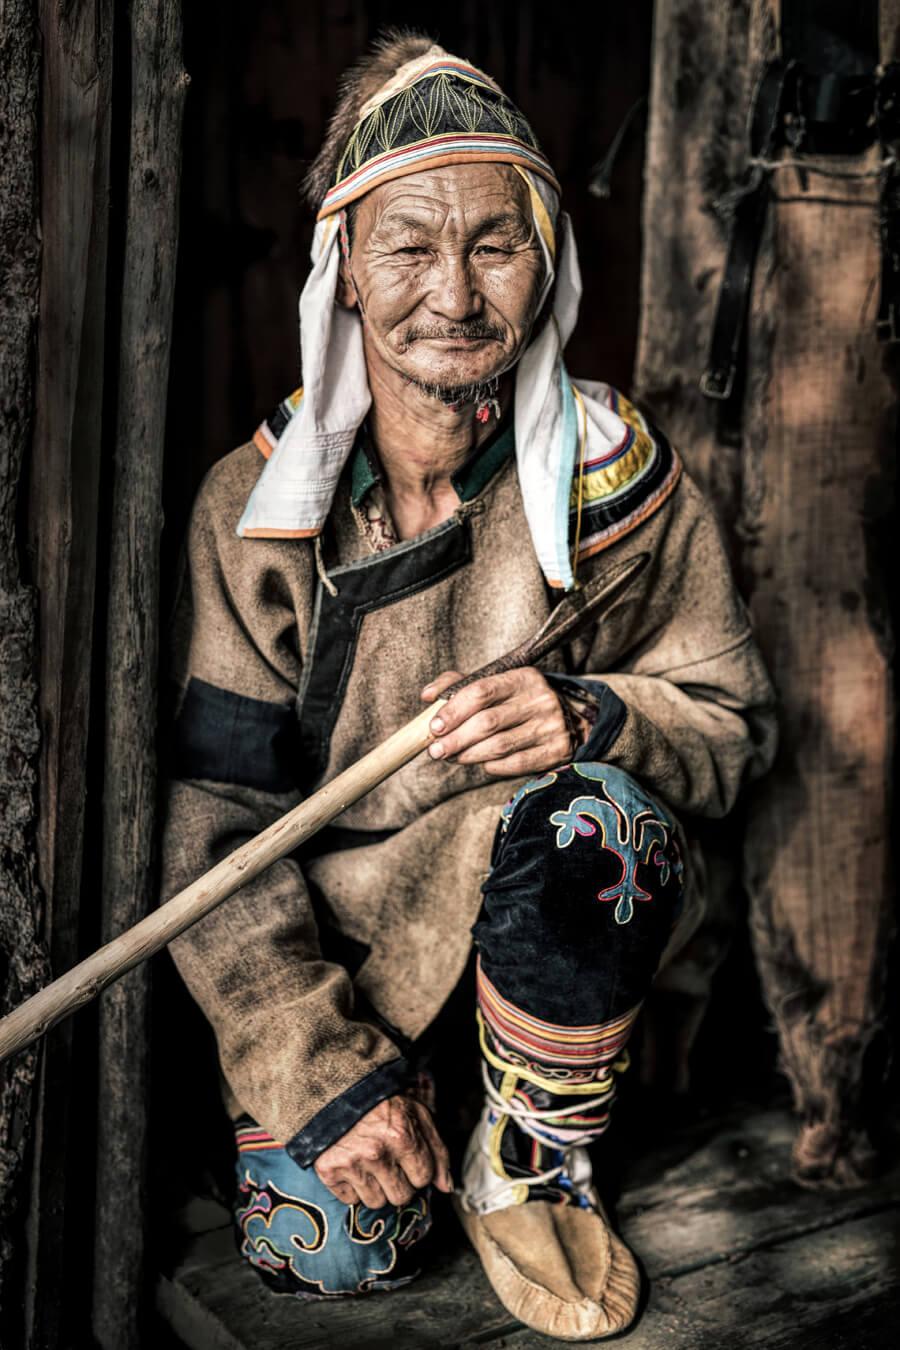 Мужчина удэгеец. Приморский Край © Александр Химушин / The World In Faces